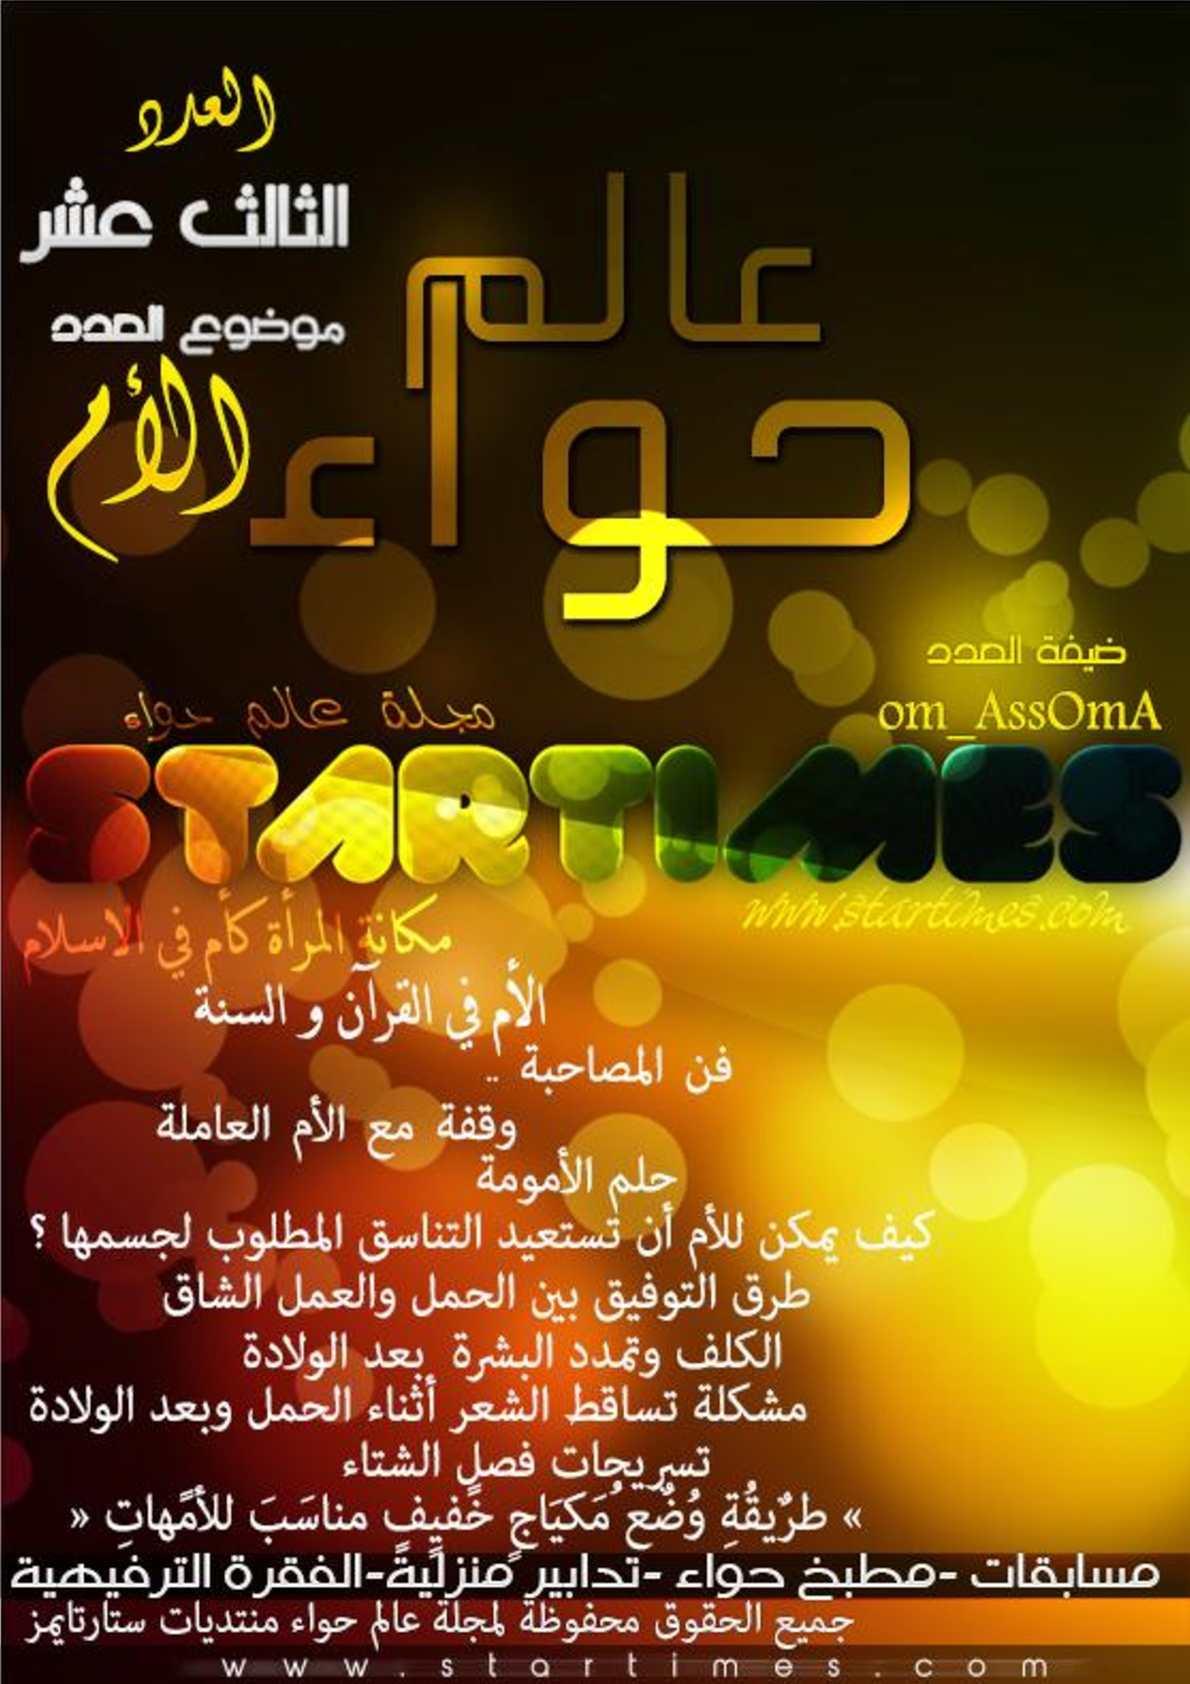 62c679579c579 Calaméo - MAGAZINE HAWA muslim 13 -02